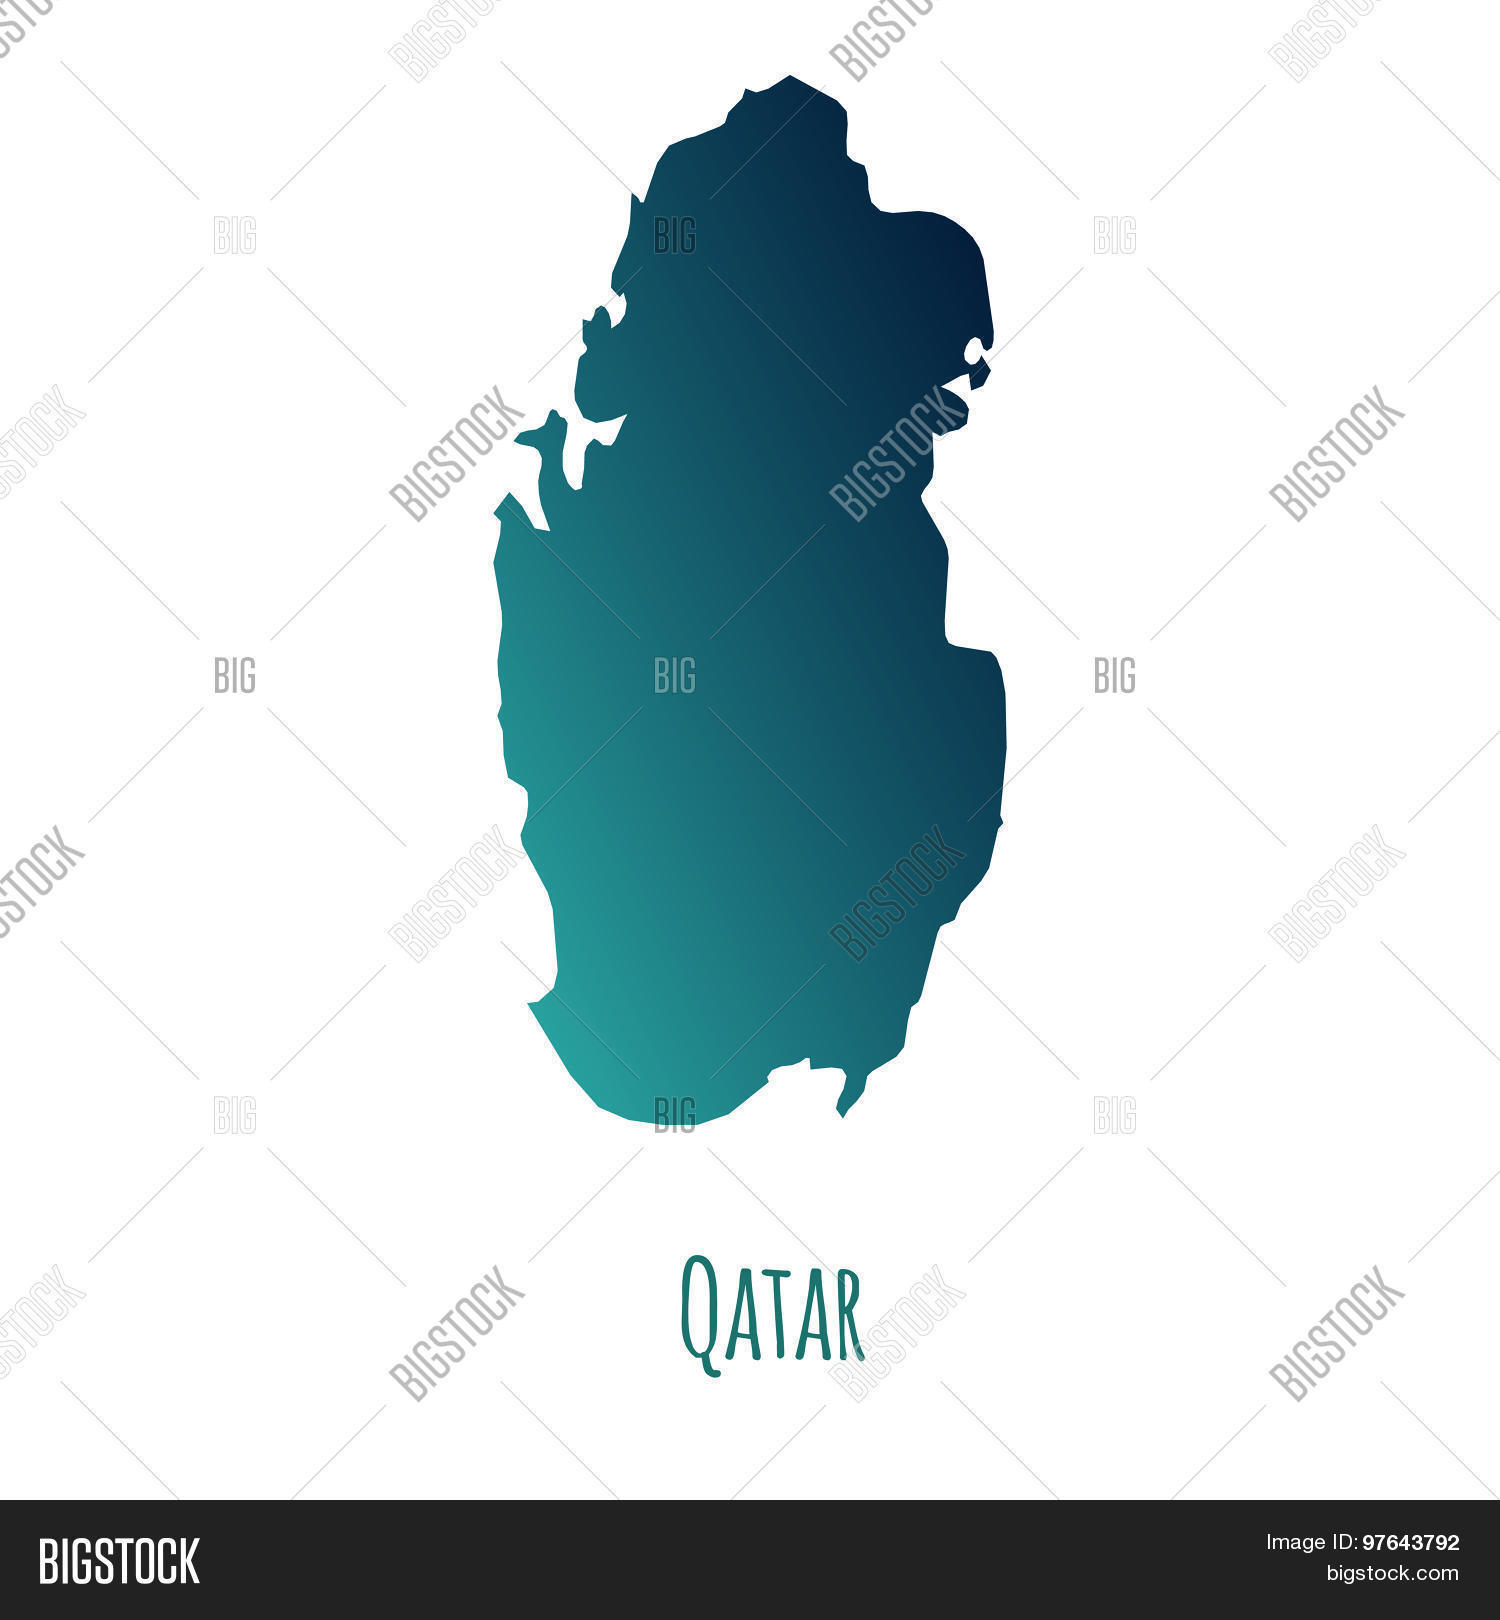 Qatar Map Vector & Photo (Free Trial) | Bigstock